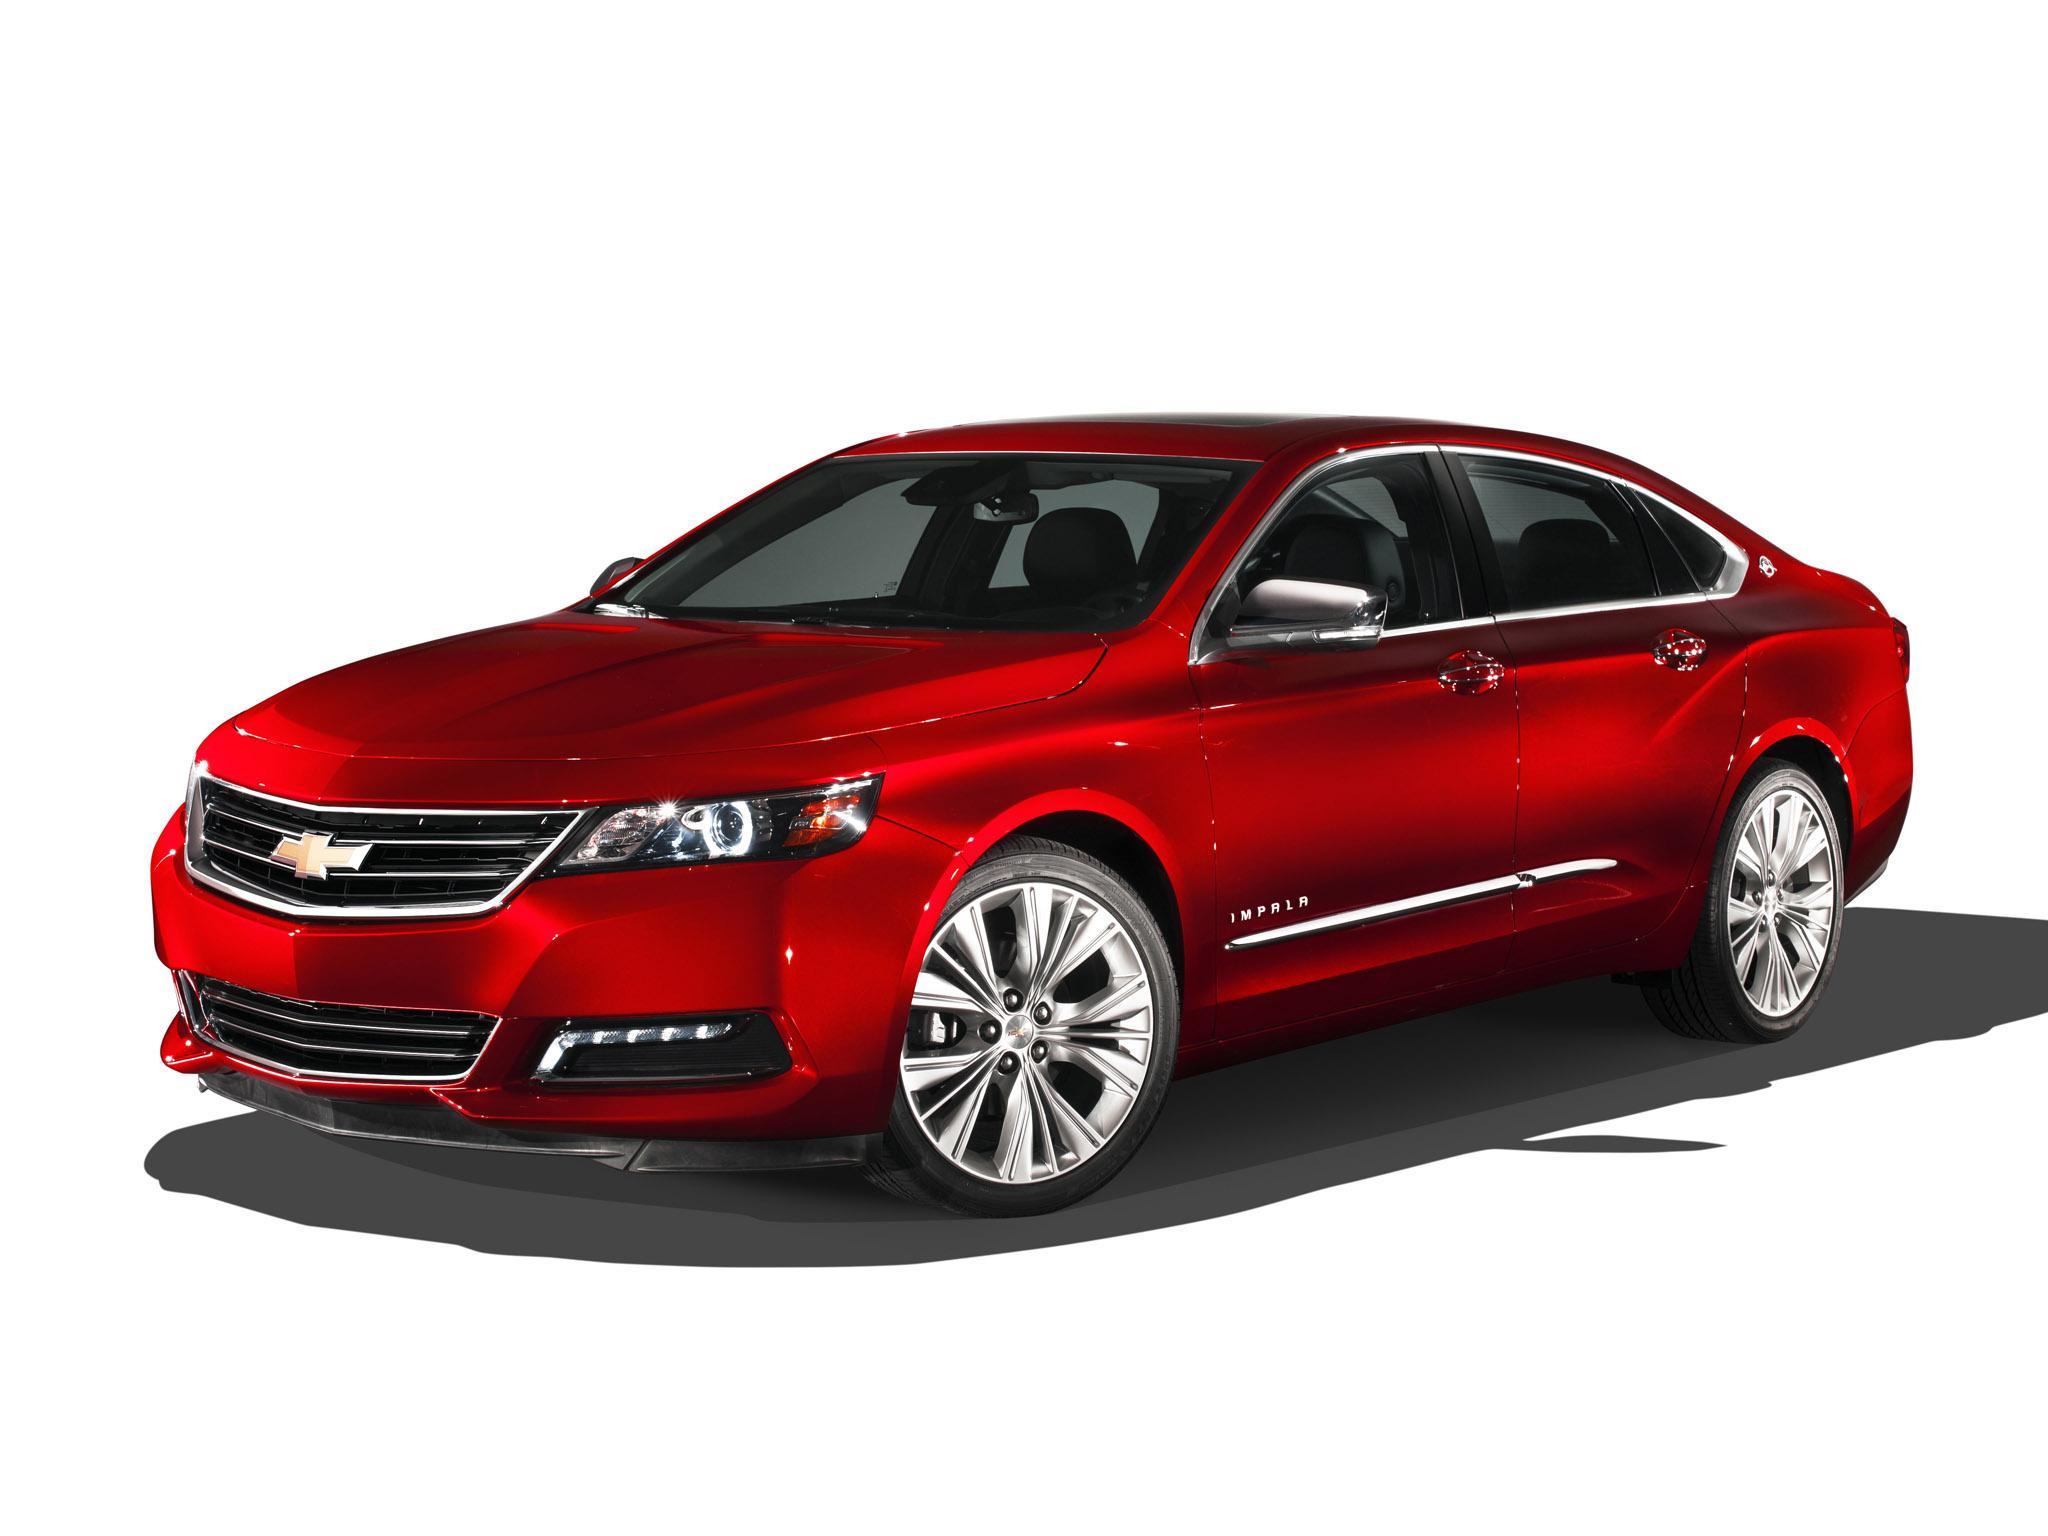 chevrolet impala related images start 450 weili automotive network. Black Bedroom Furniture Sets. Home Design Ideas